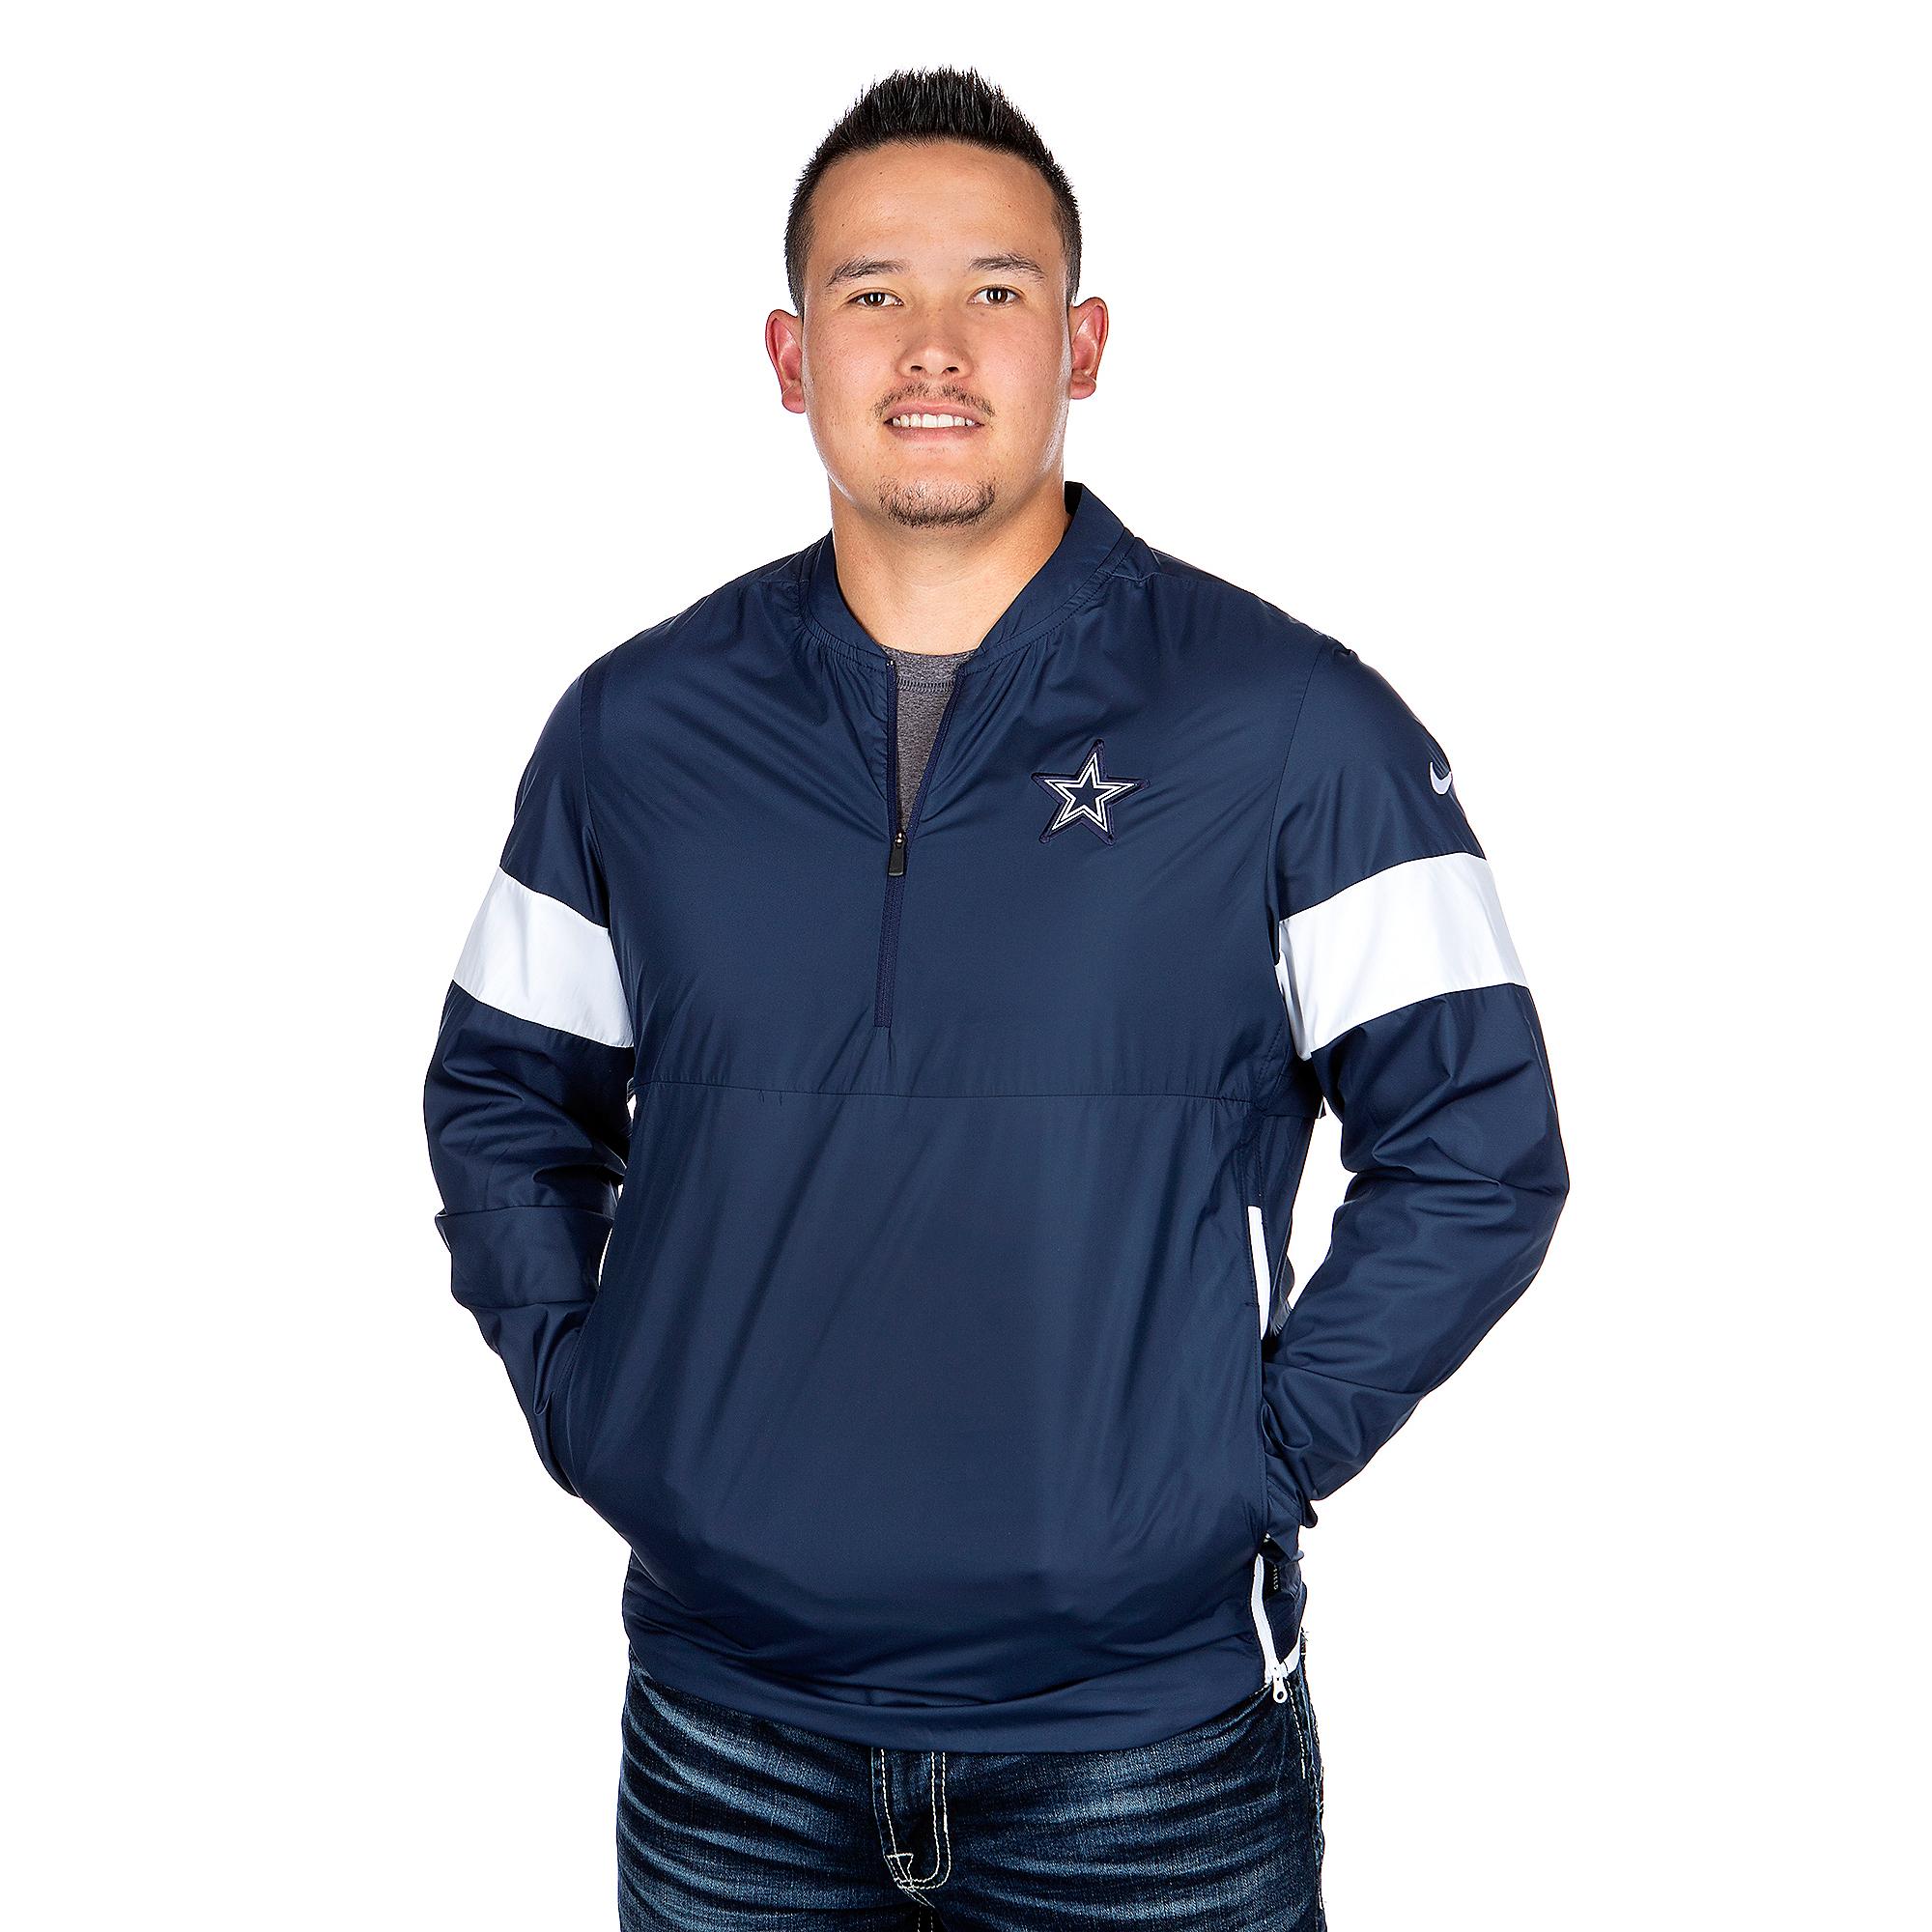 online store c9ffd 7cd44 Dallas Cowboys Nike Lightweight Coach Jacket | Dallas Cowboys Pro Shop